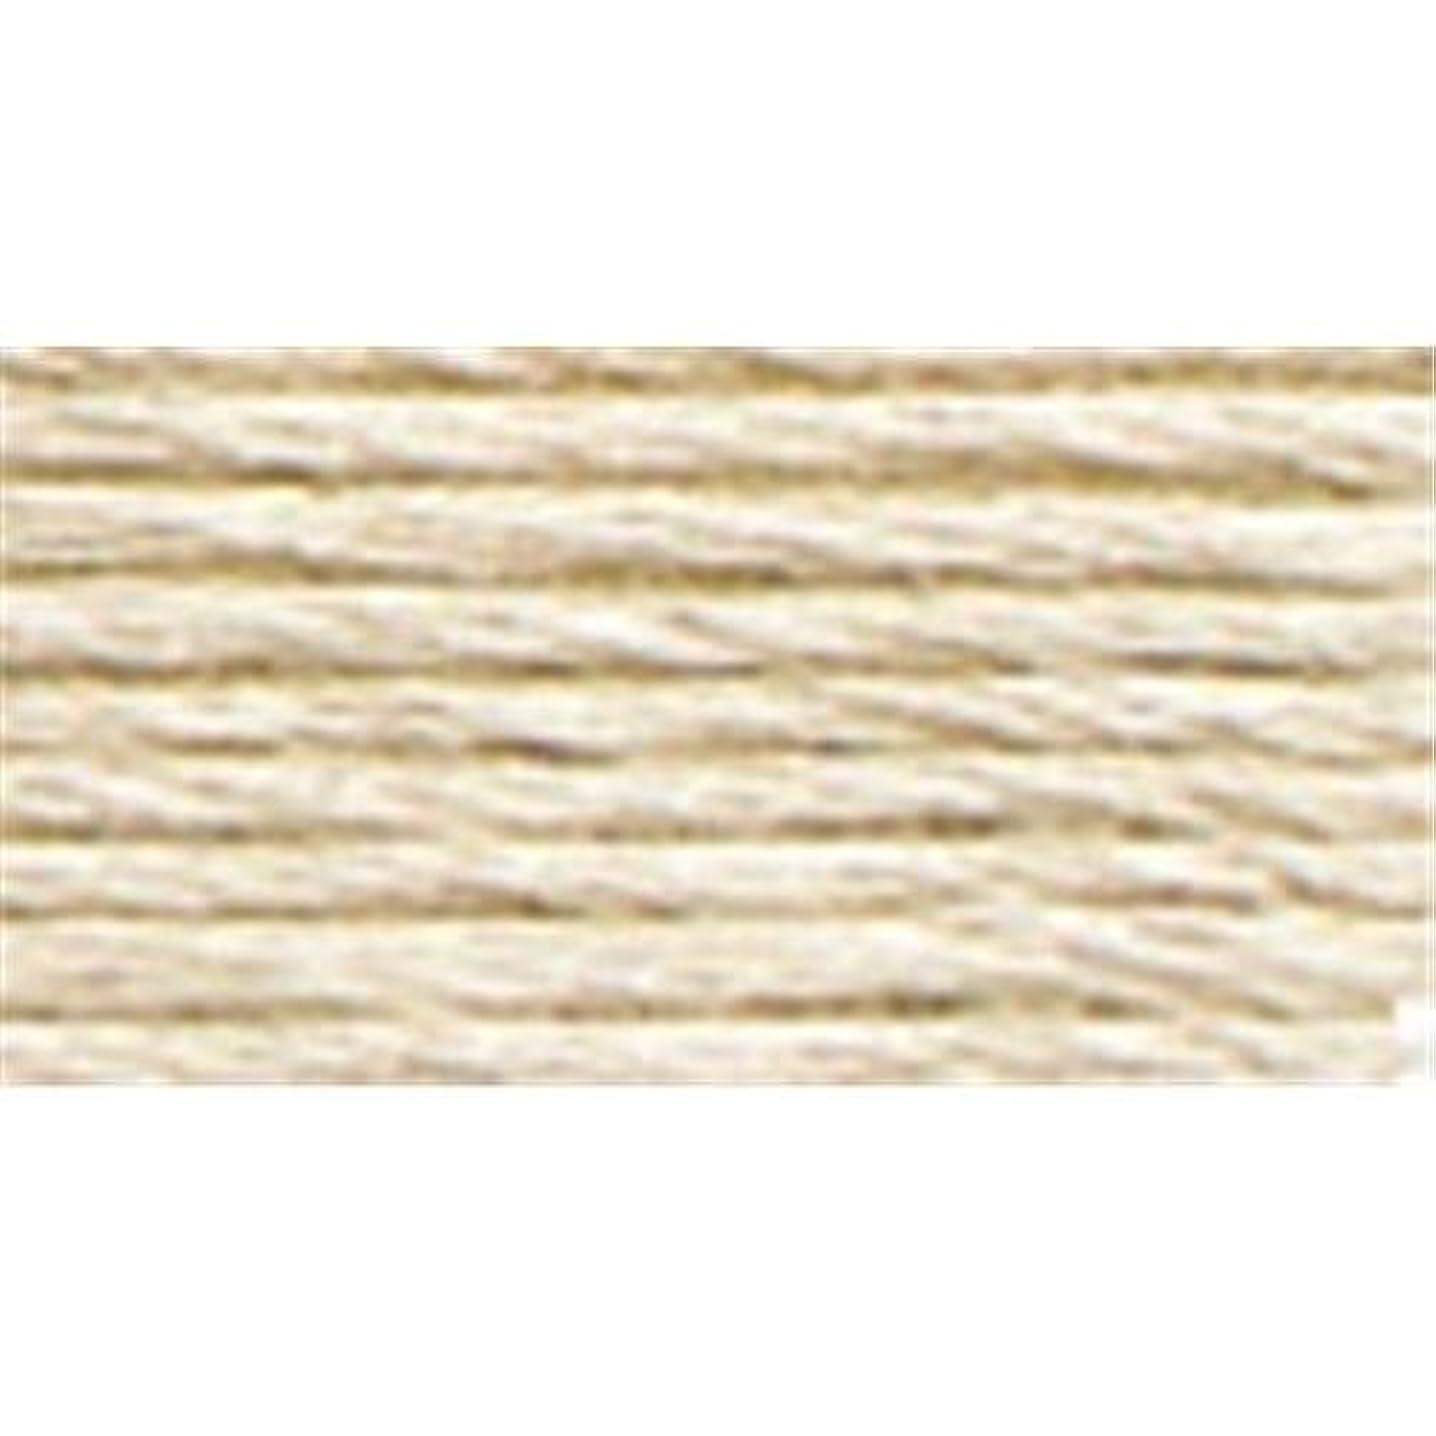 DMC 116 12-3033 Pearl Cotton Thread Balls, Very Light Mocha Brown, Size 12